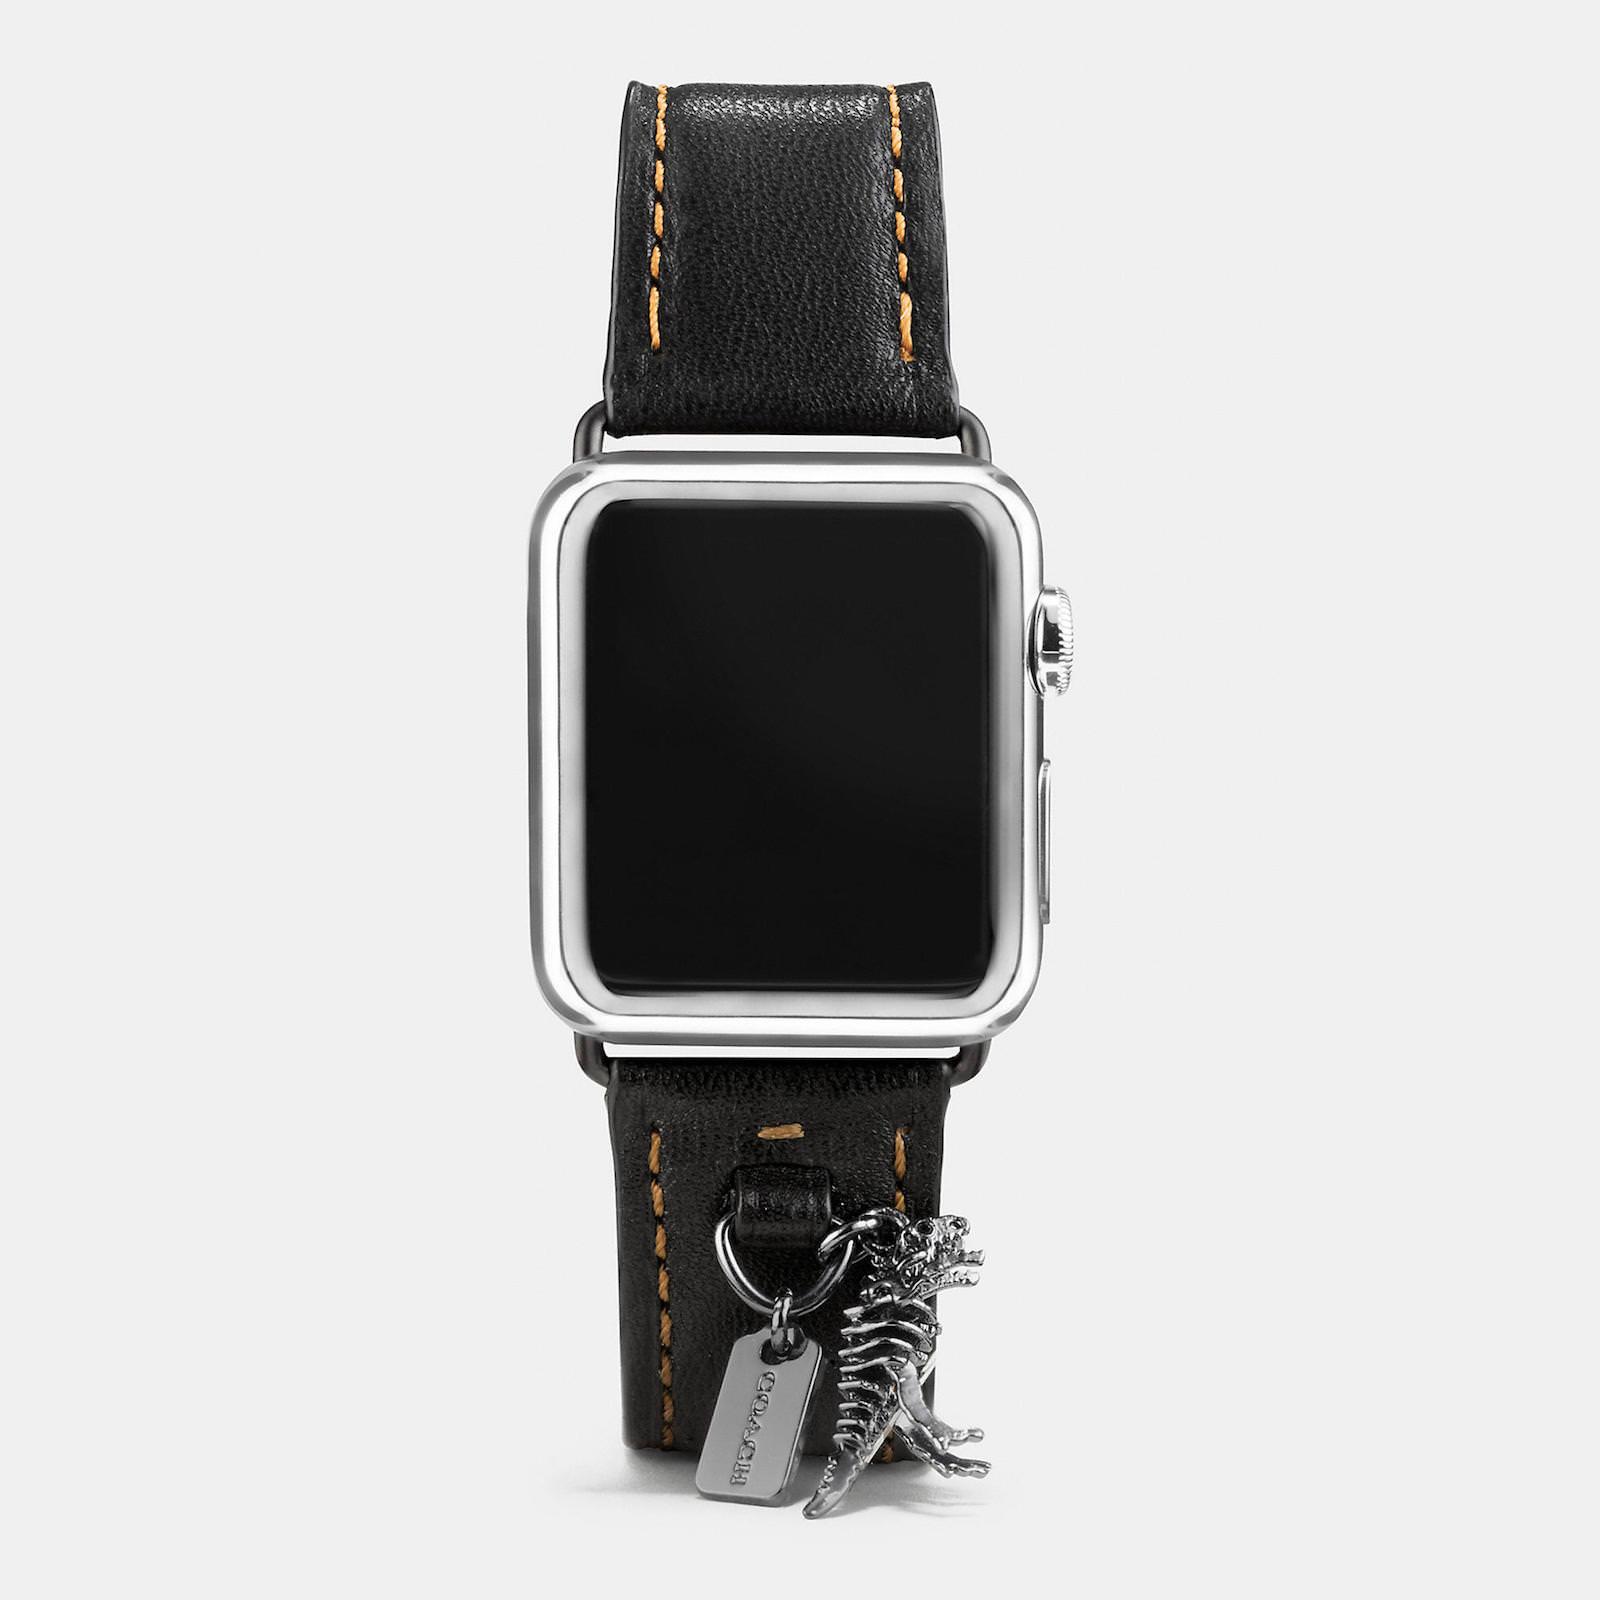 Apple-Watch-Coach-Band-Autumn-Season-9.jpeg